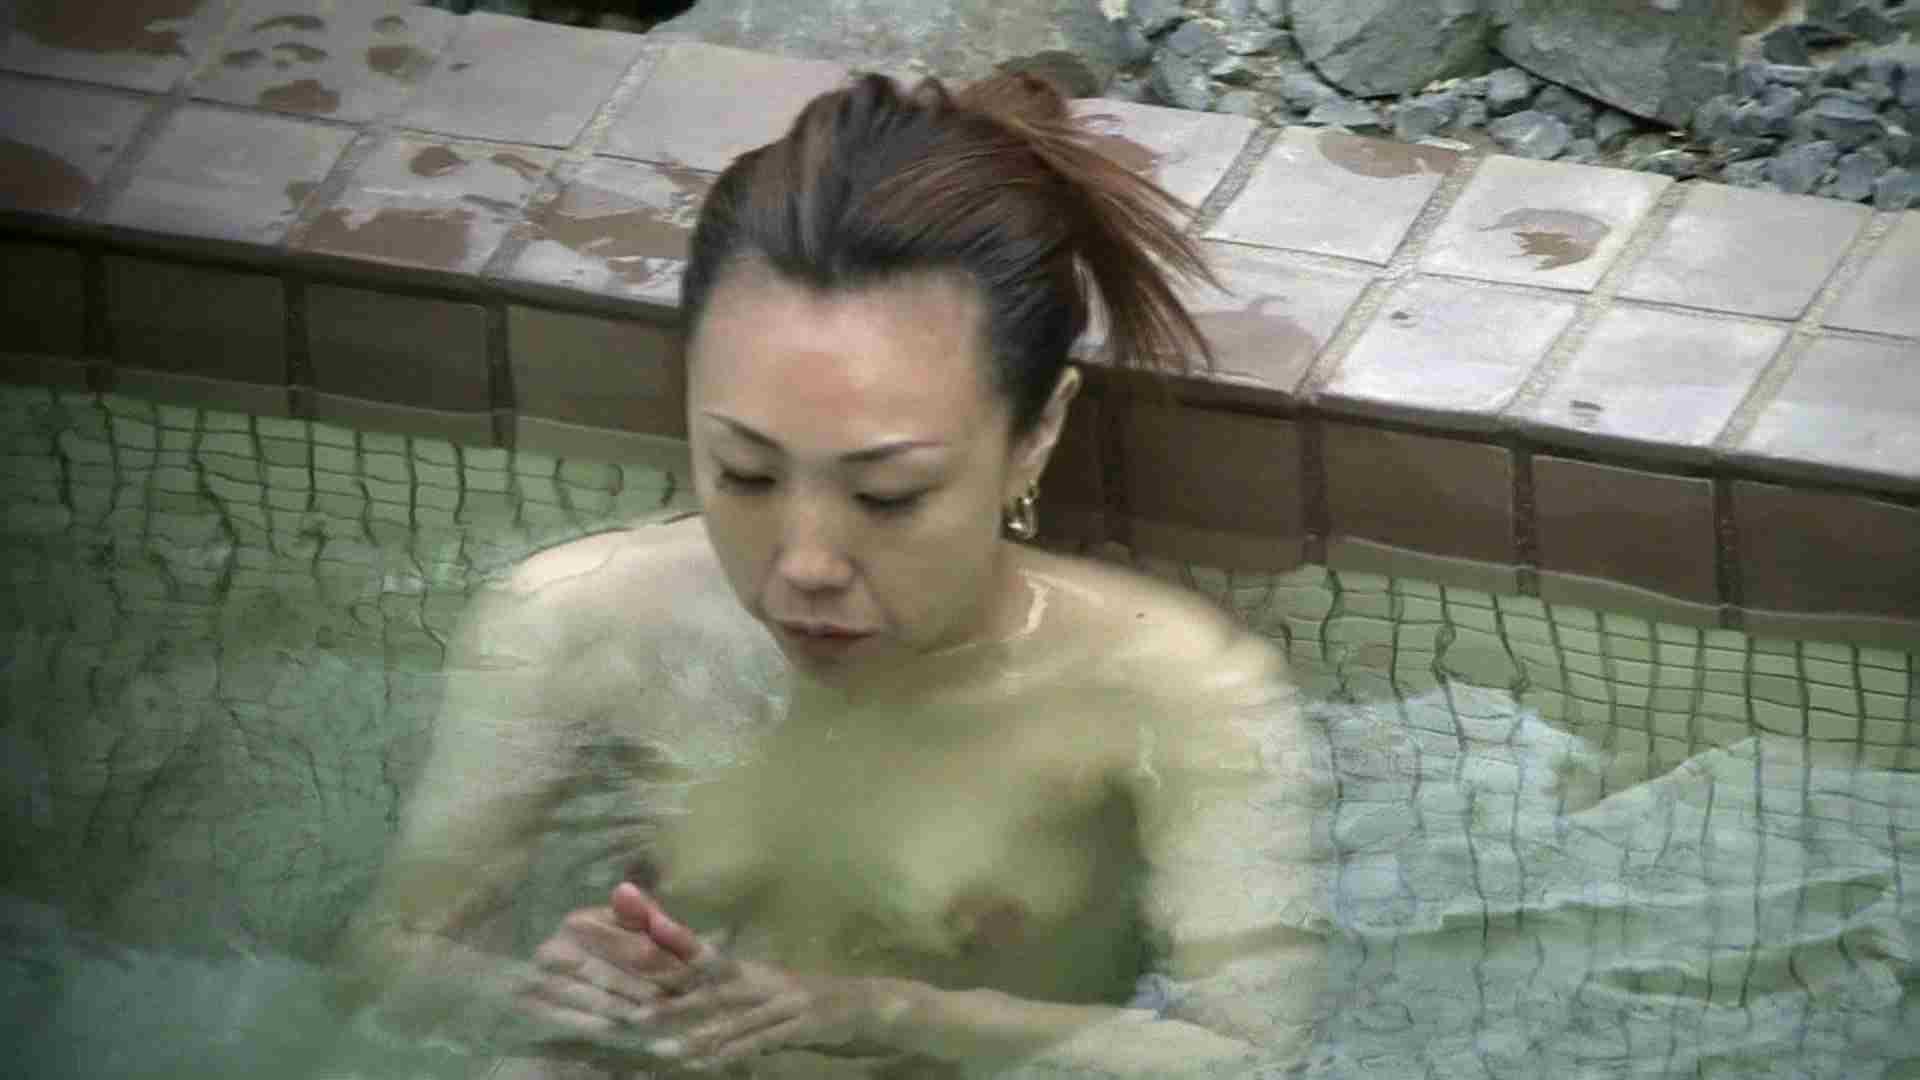 Aquaな露天風呂Vol.654 女体盗撮   OL女体  87連発 31